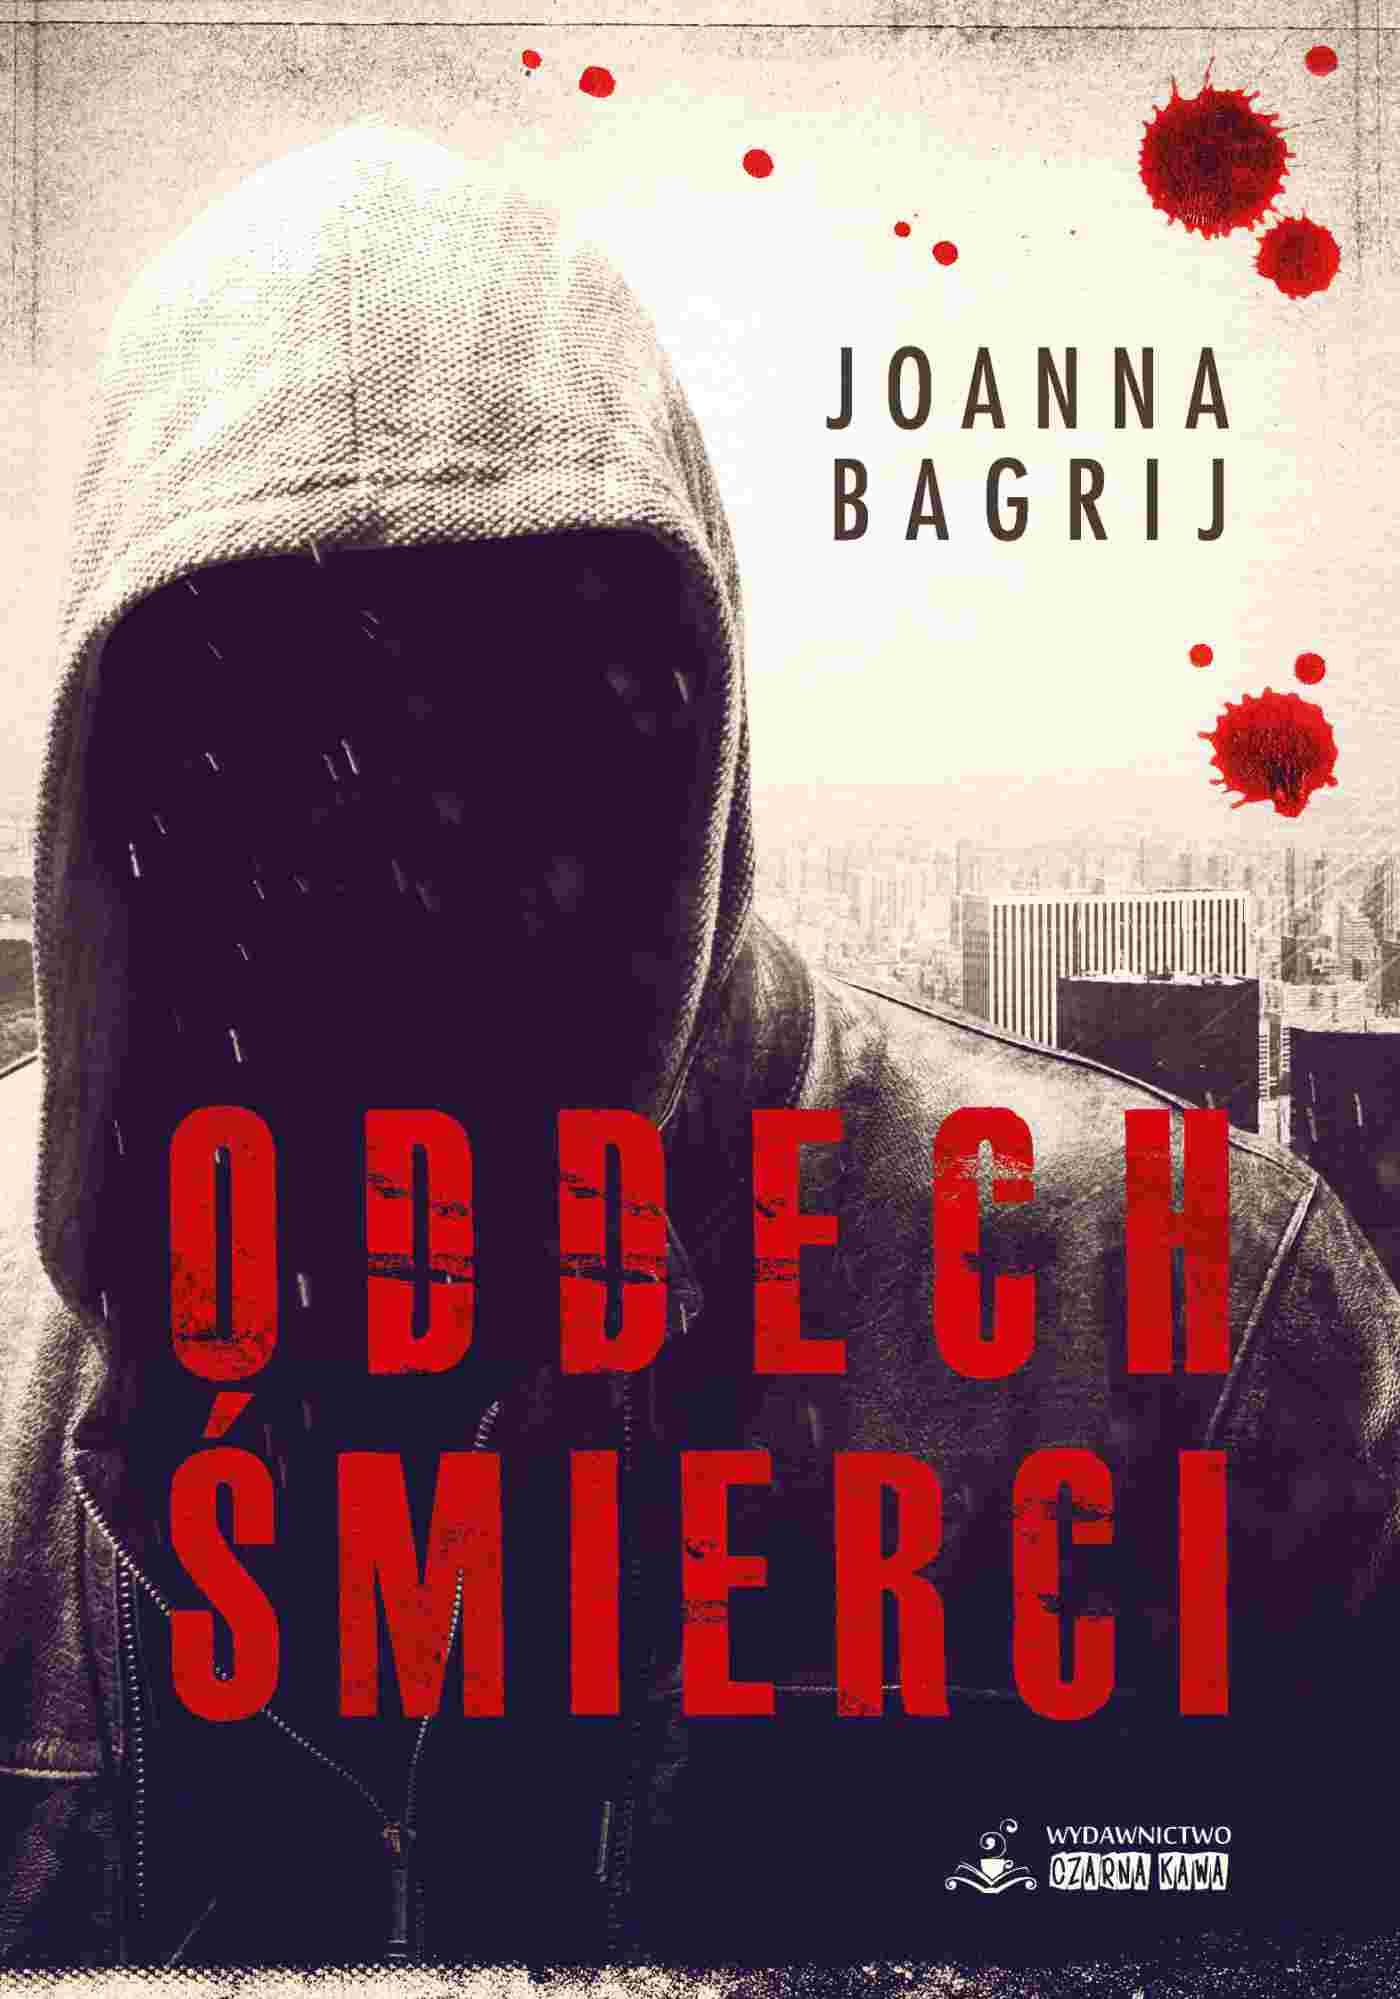 Oddech śmierci - Joanna Bagrij